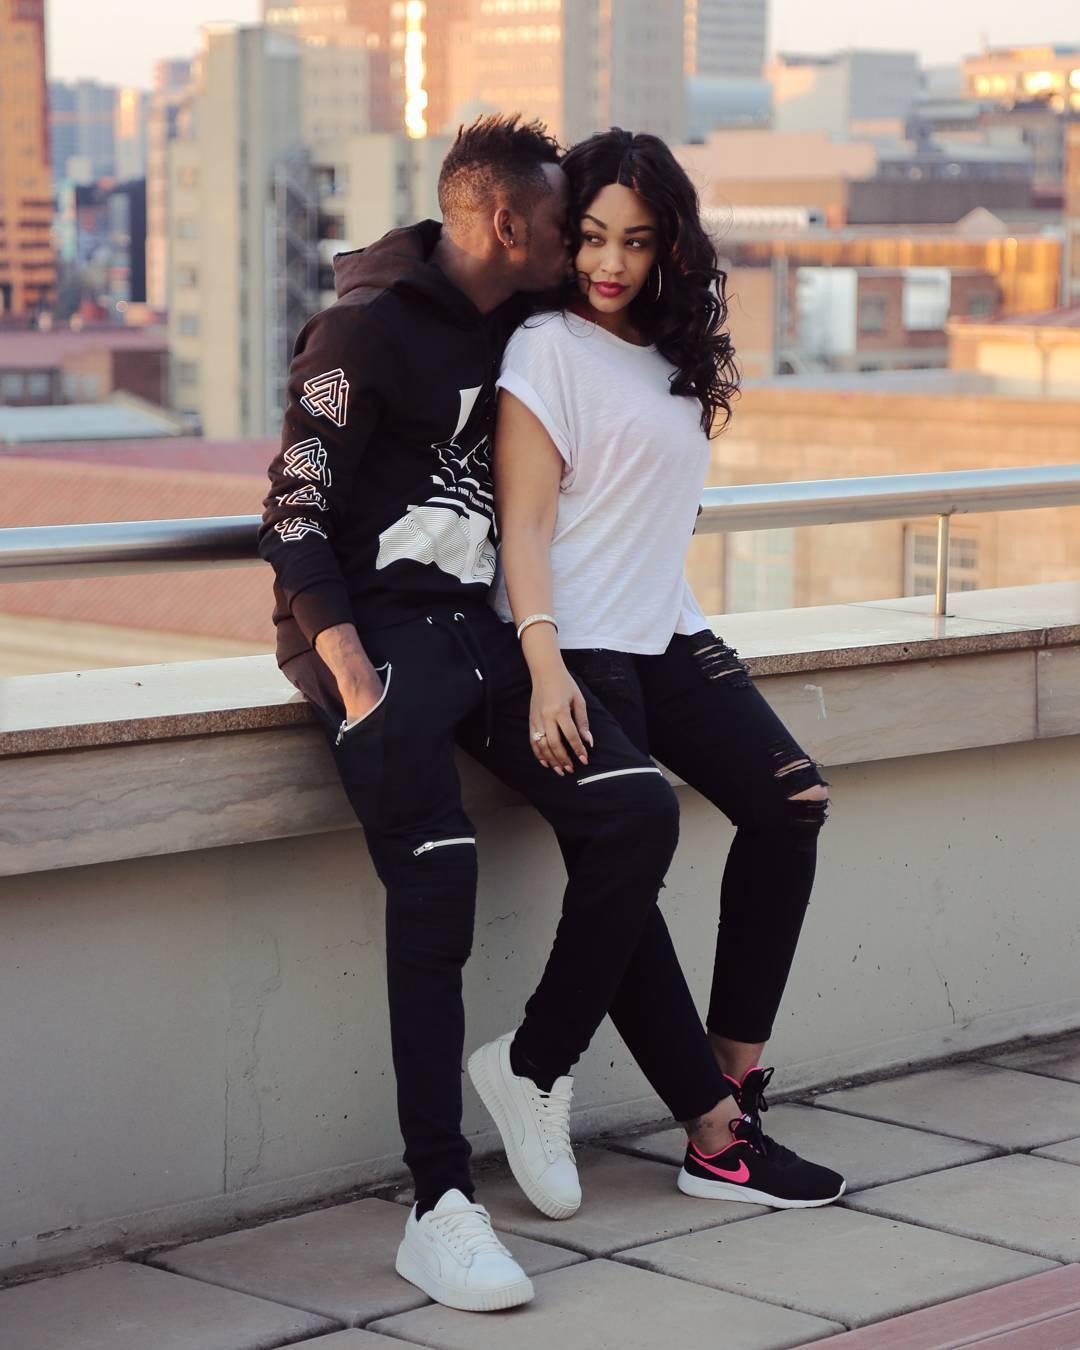 diamond zari platnumz nasty latest updates each cheated yes dispute intimate really naibuzz na couple